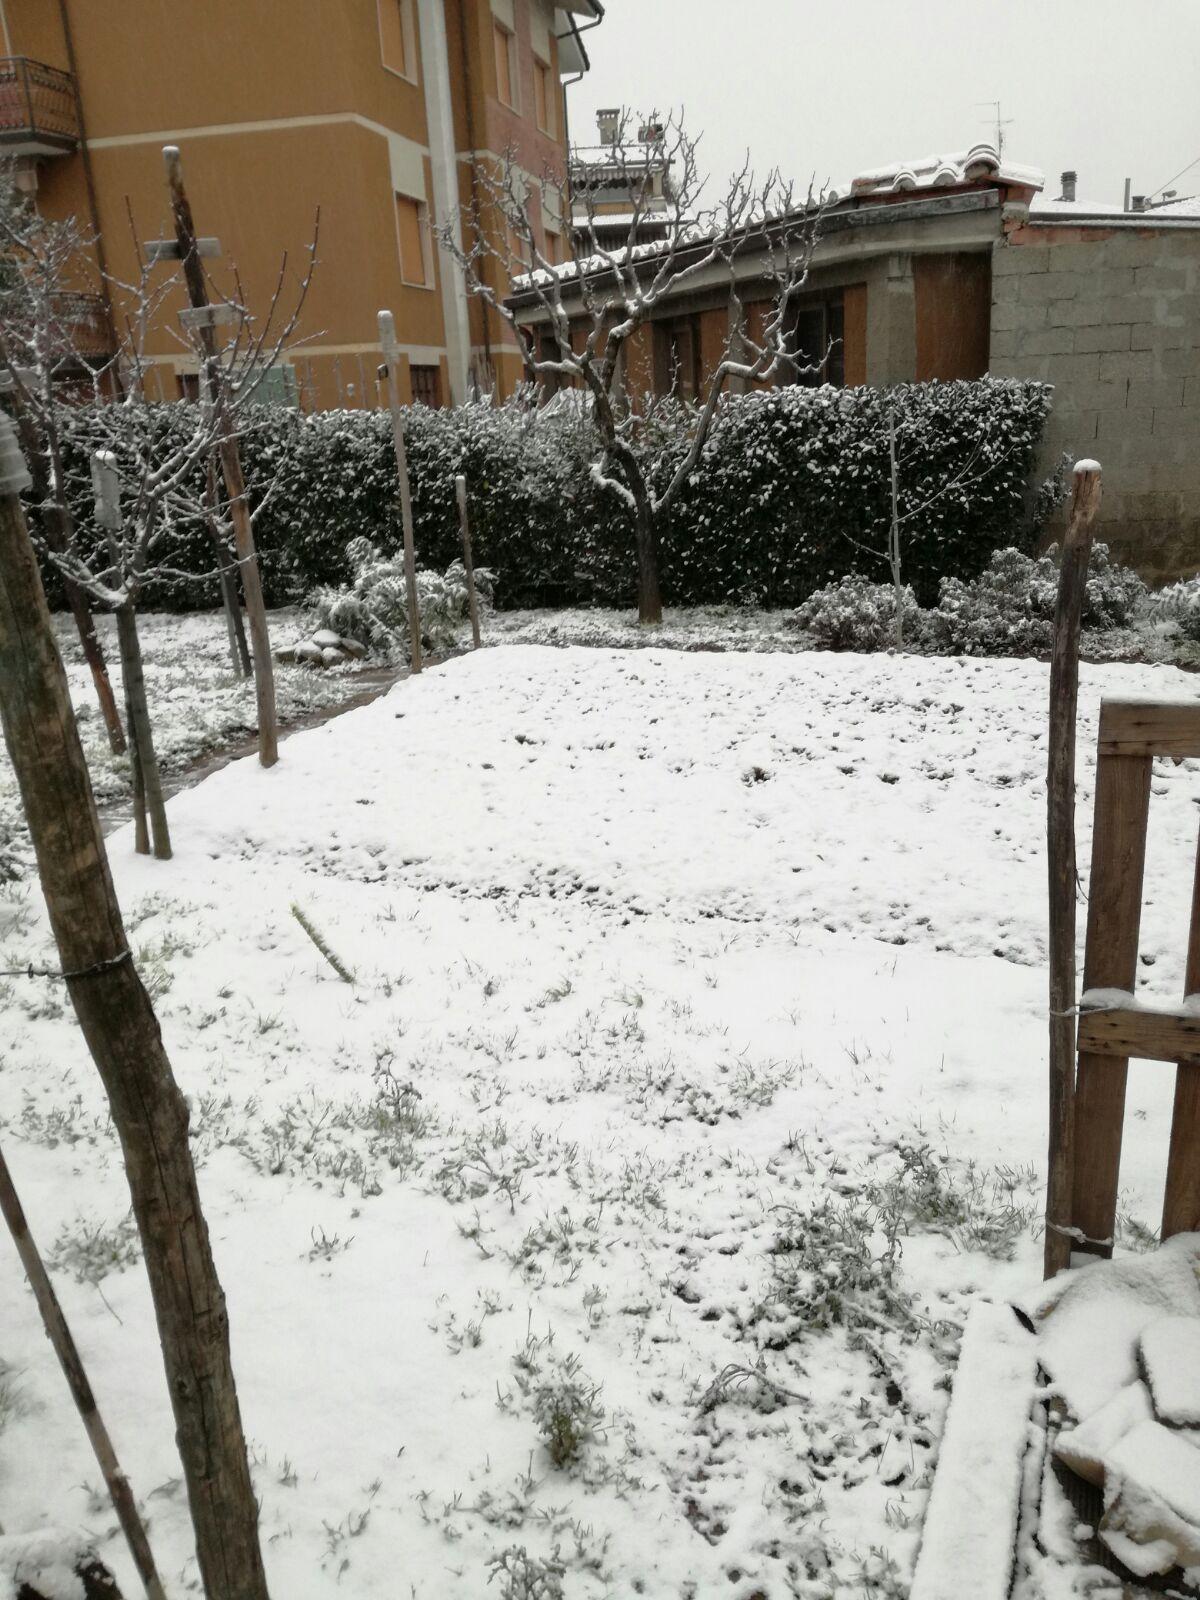 SNOW(e poi rain?)Casting Toscana Giovedi 1 marzo 2018-img-20180301-wa0033.jpg